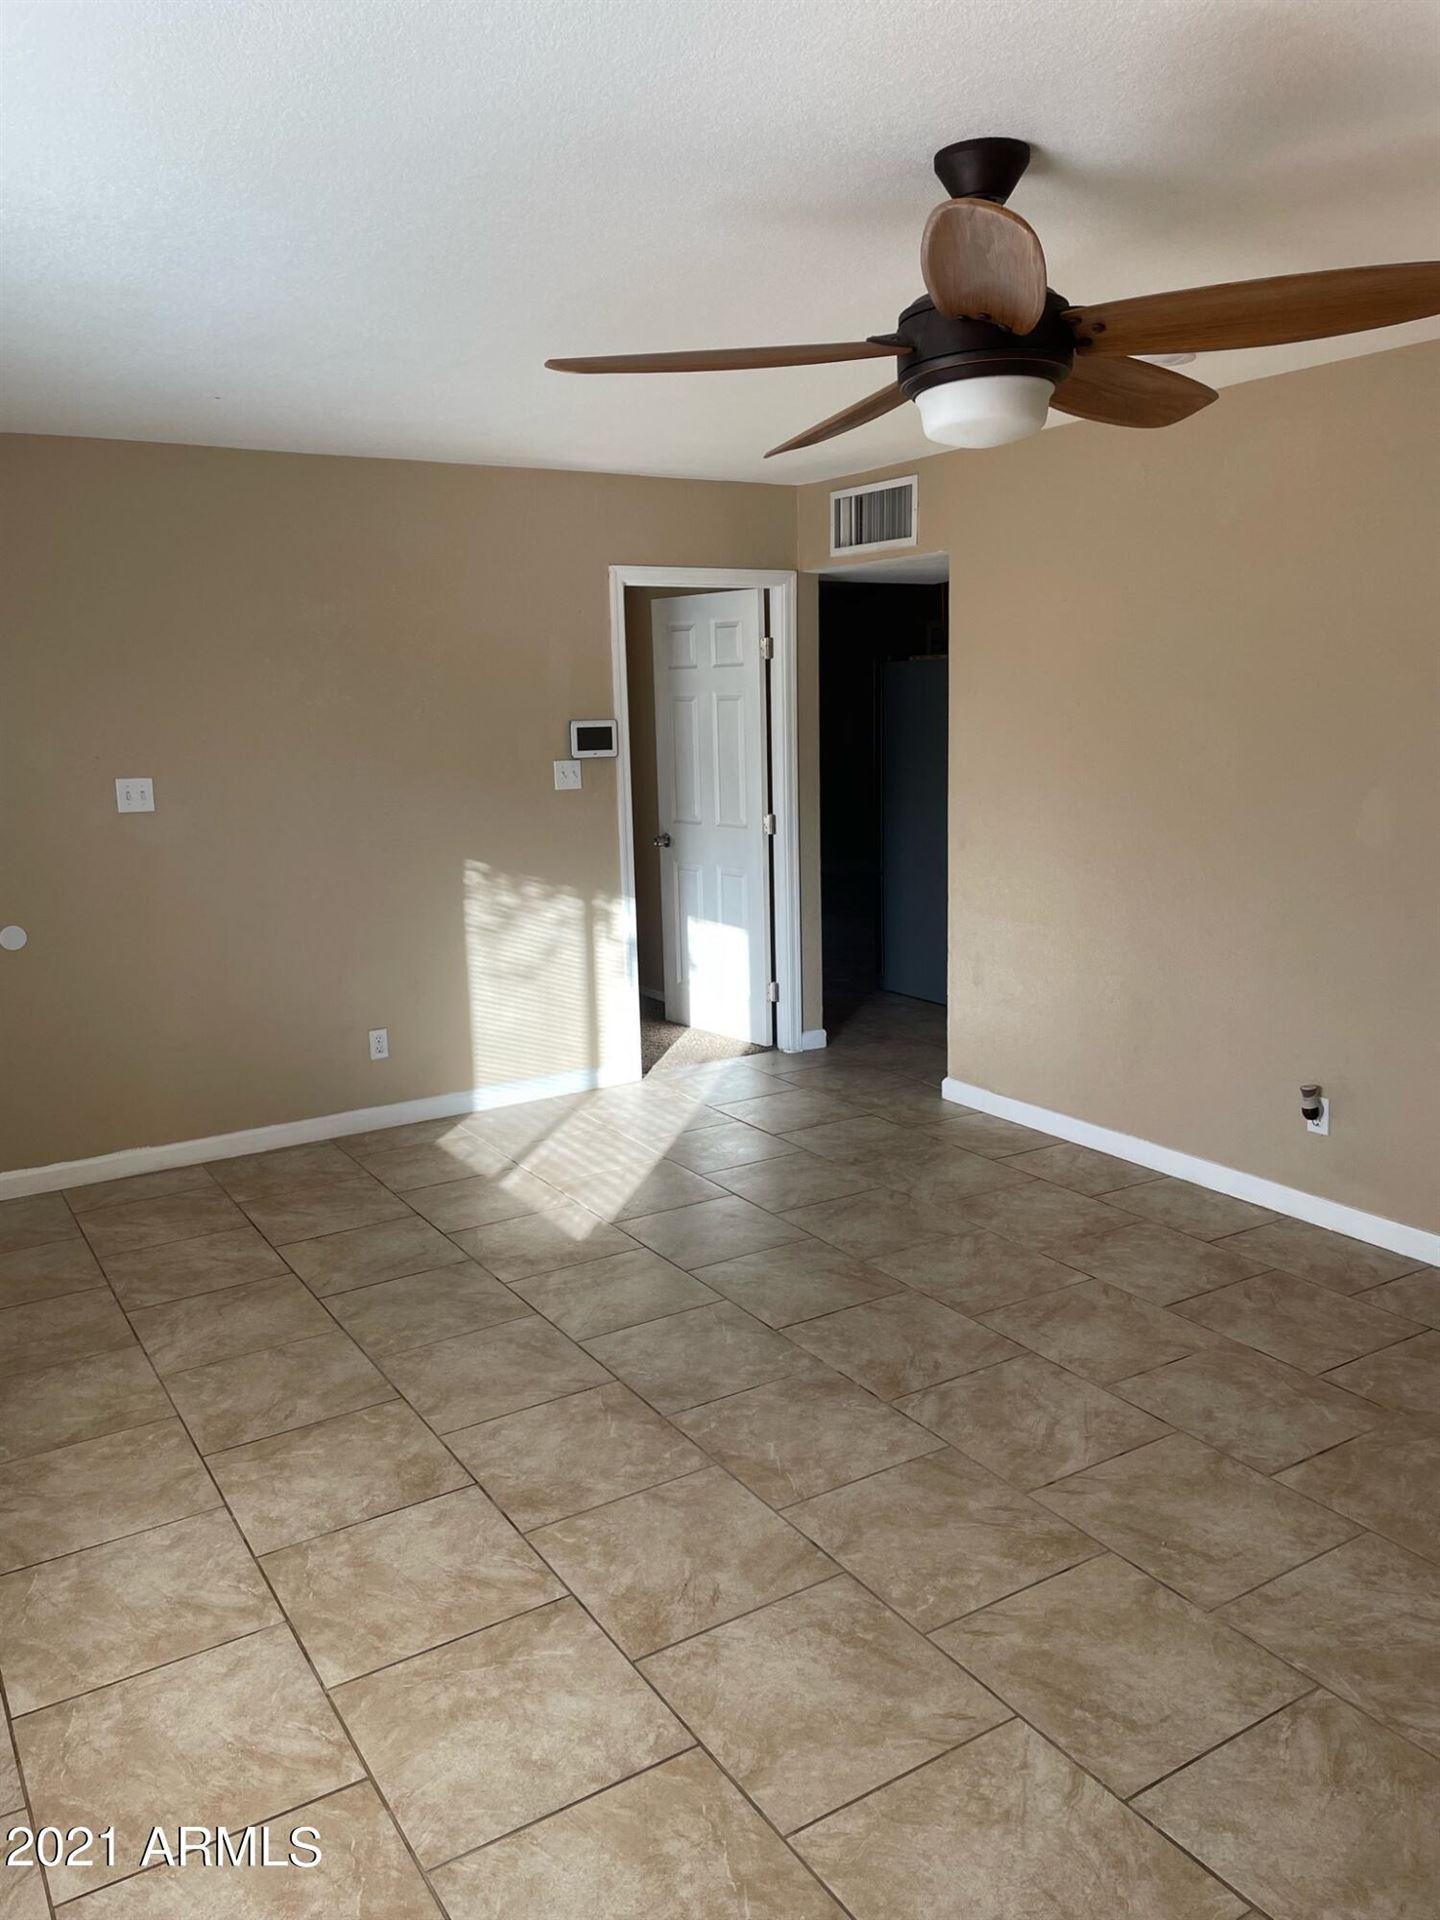 Photo of 6961 W WOLF Street, Phoenix, AZ 85033 (MLS # 6250116)